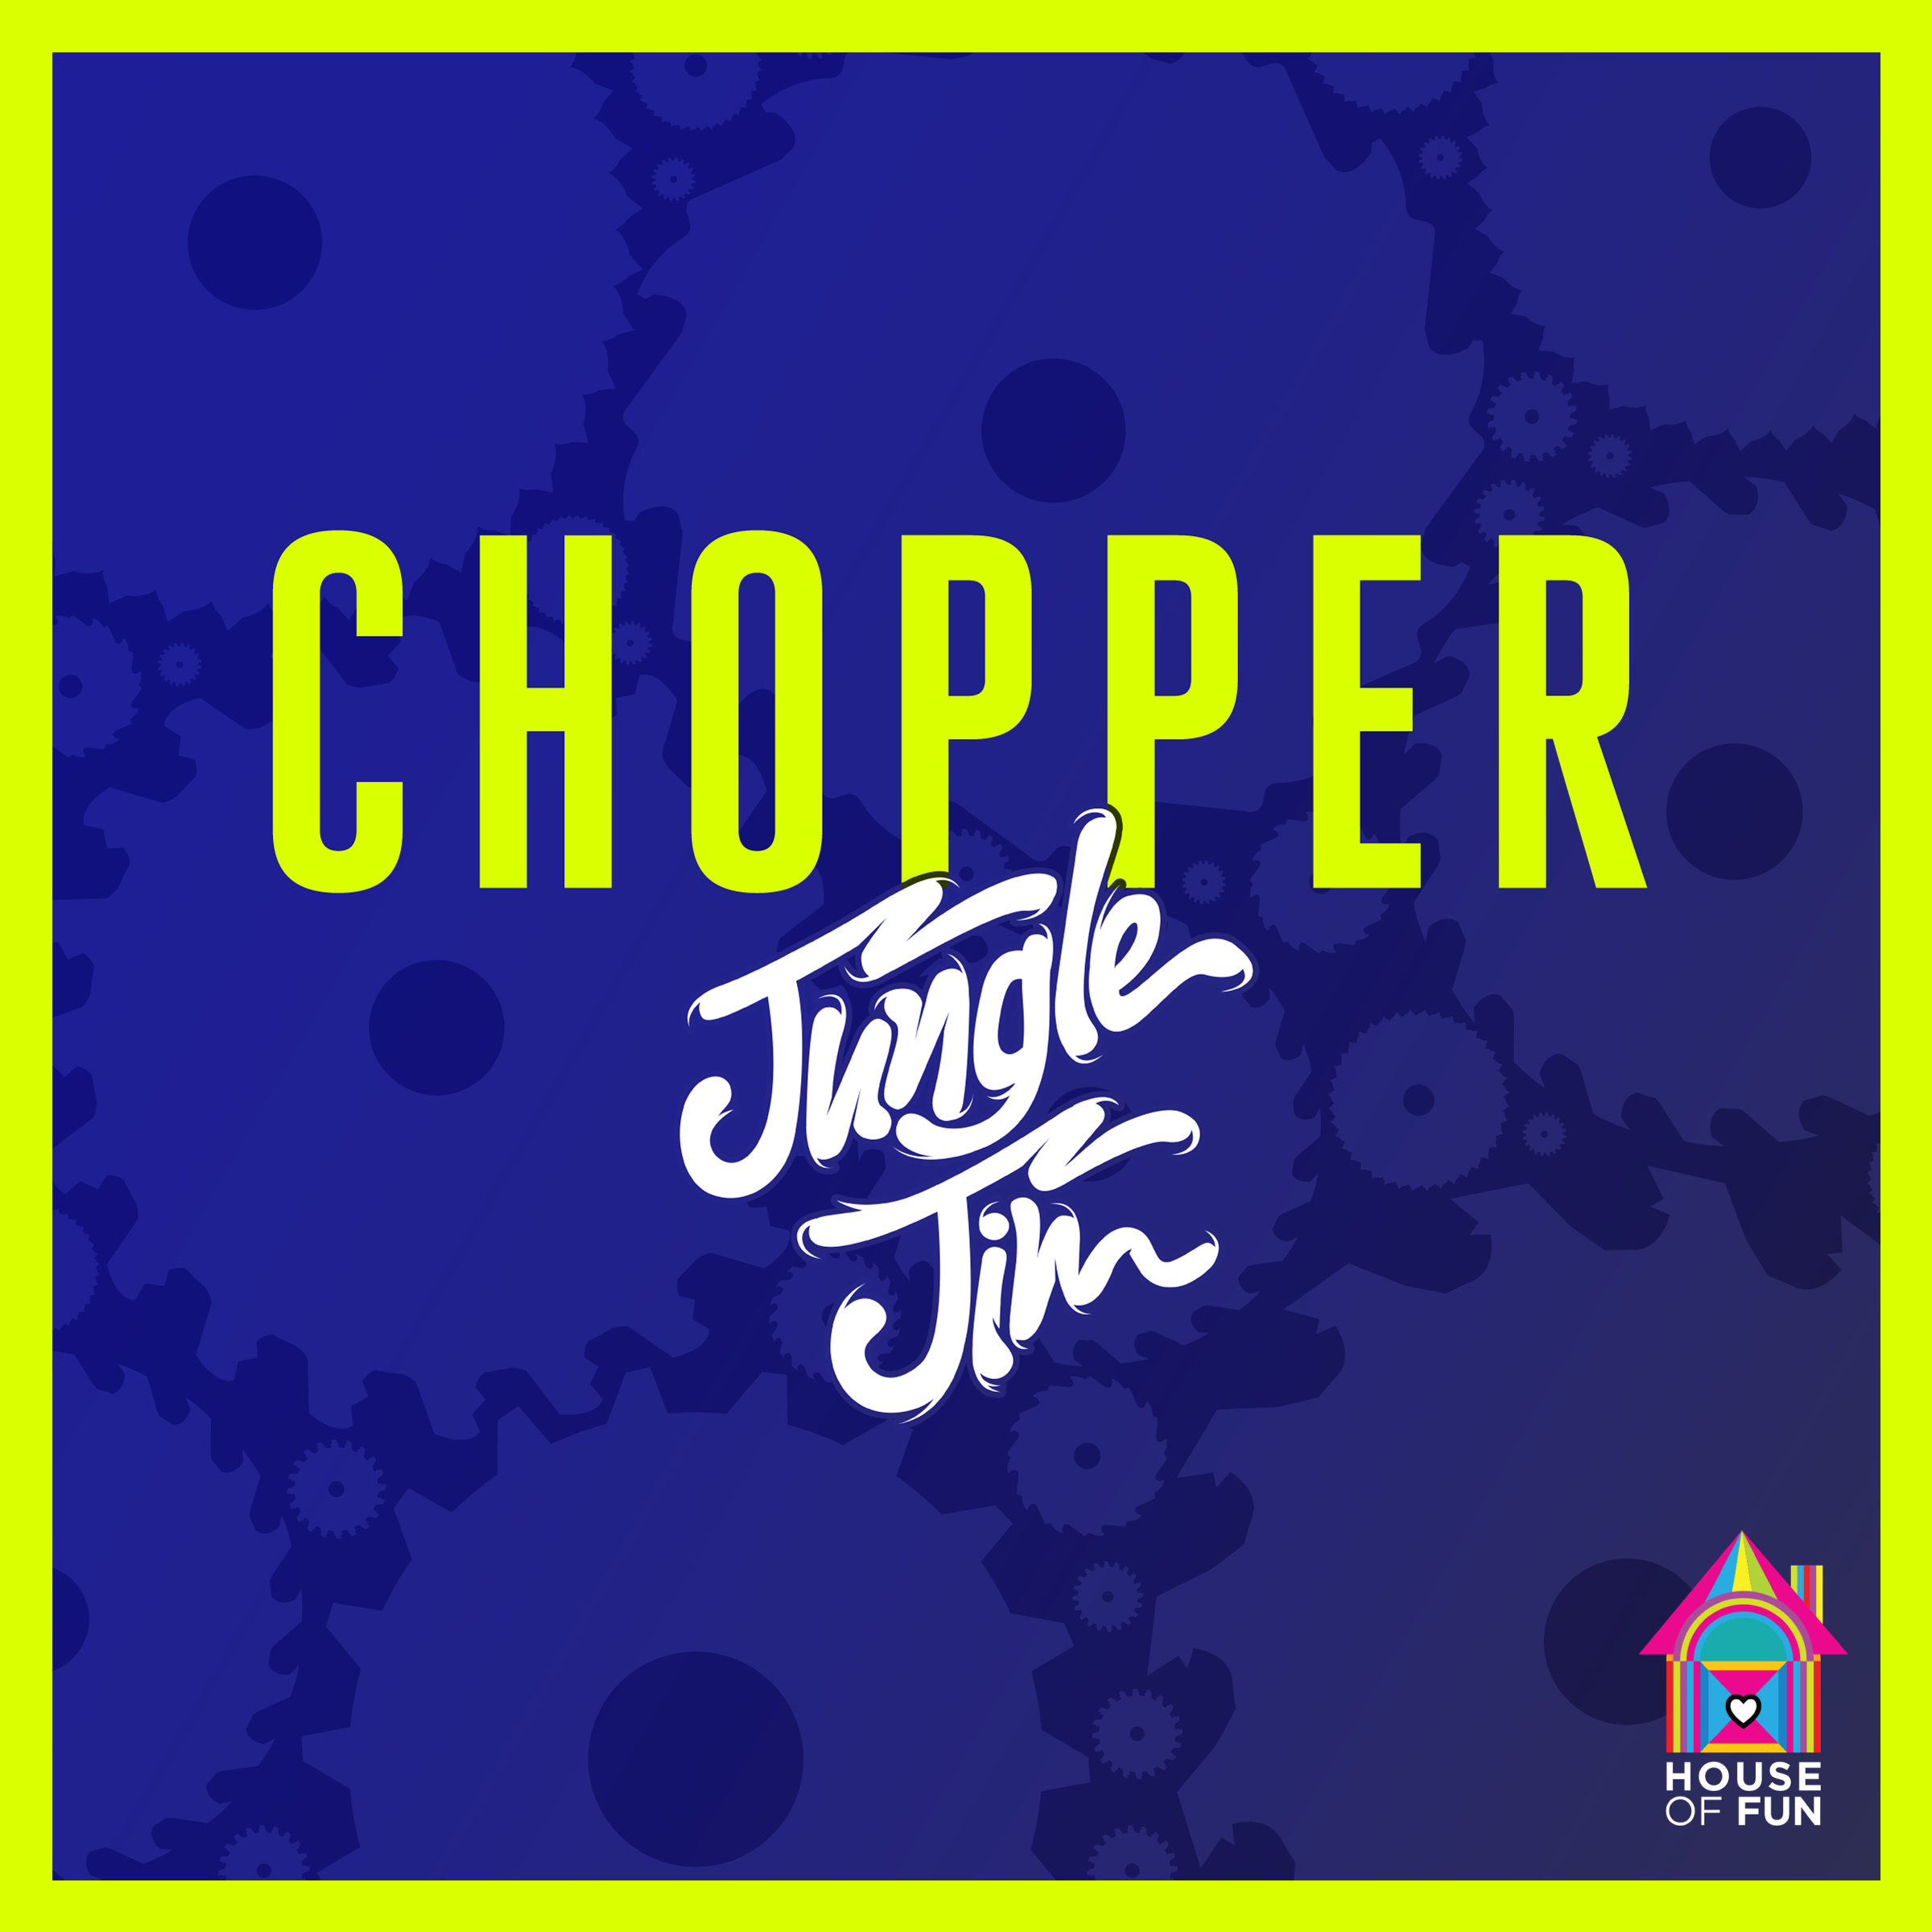 JJ_Chopper